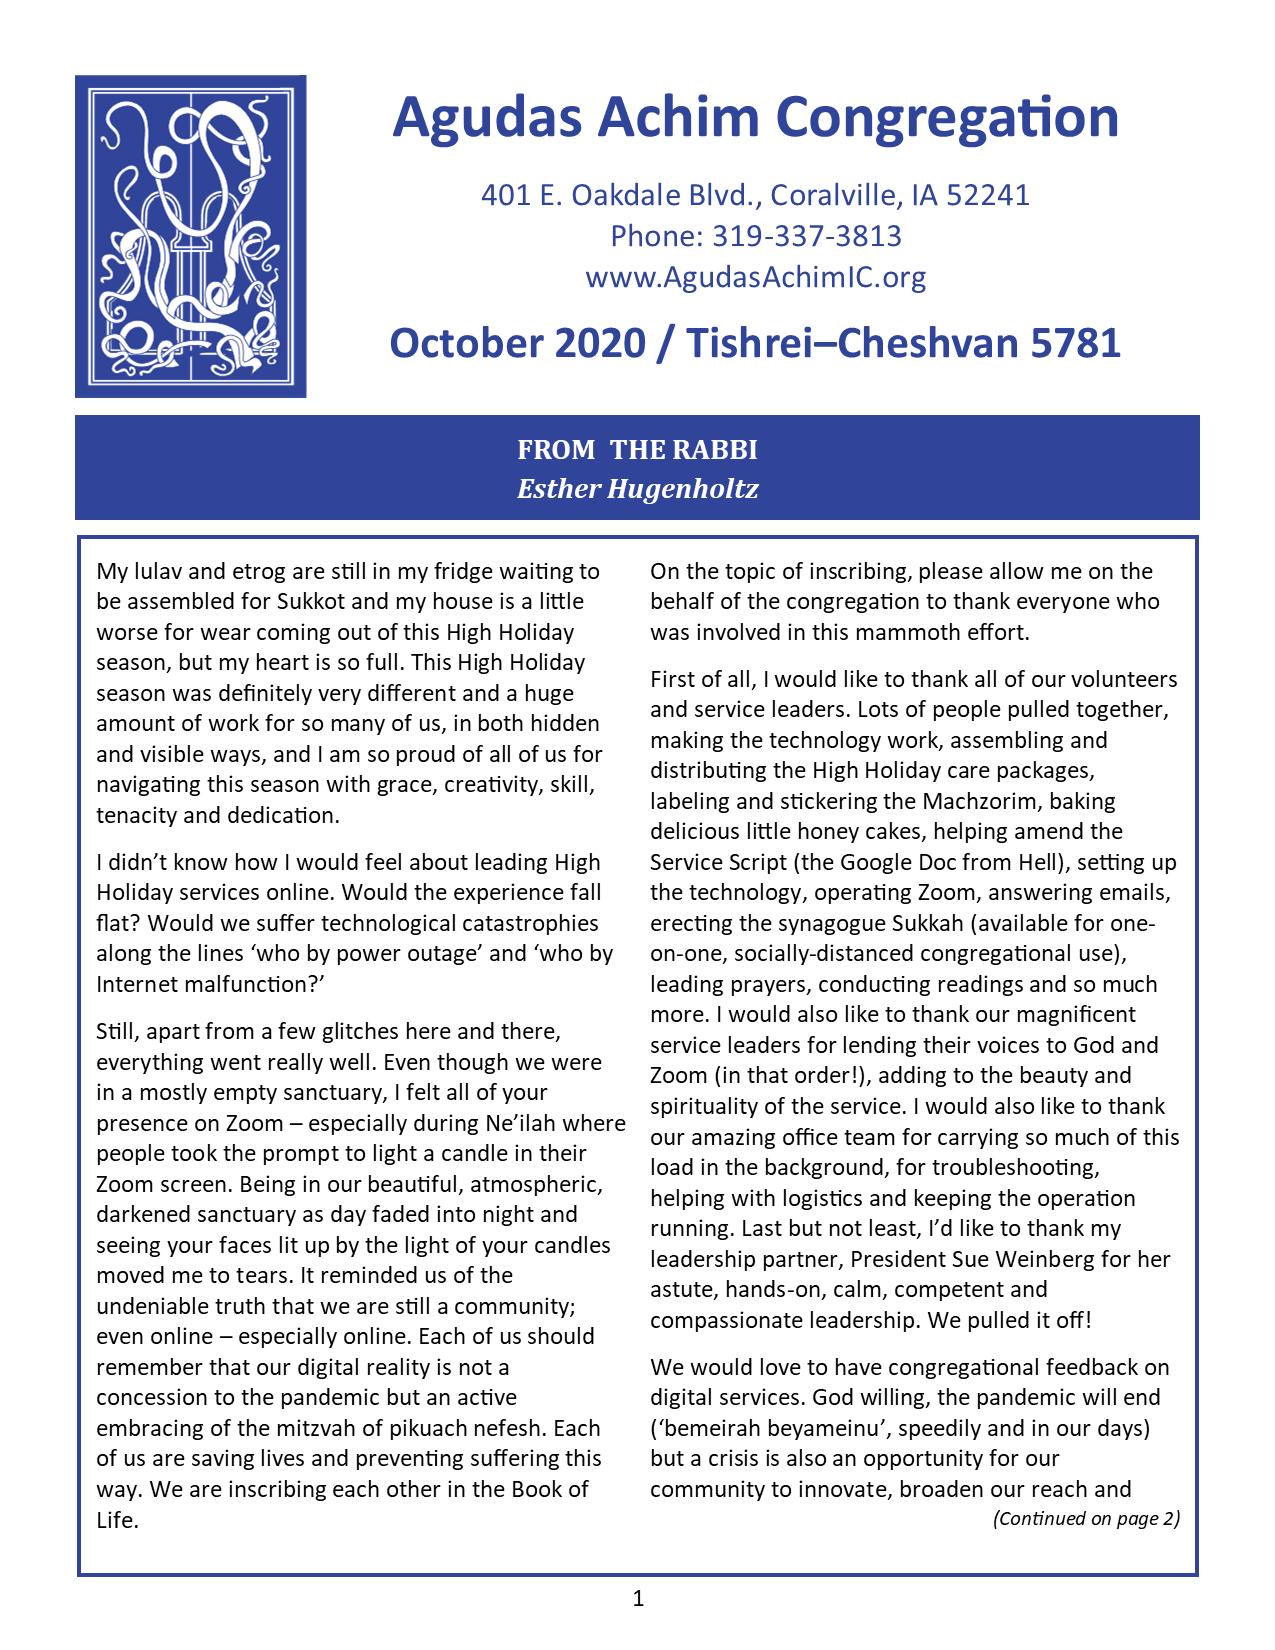 October 2020 Bulletin Cover